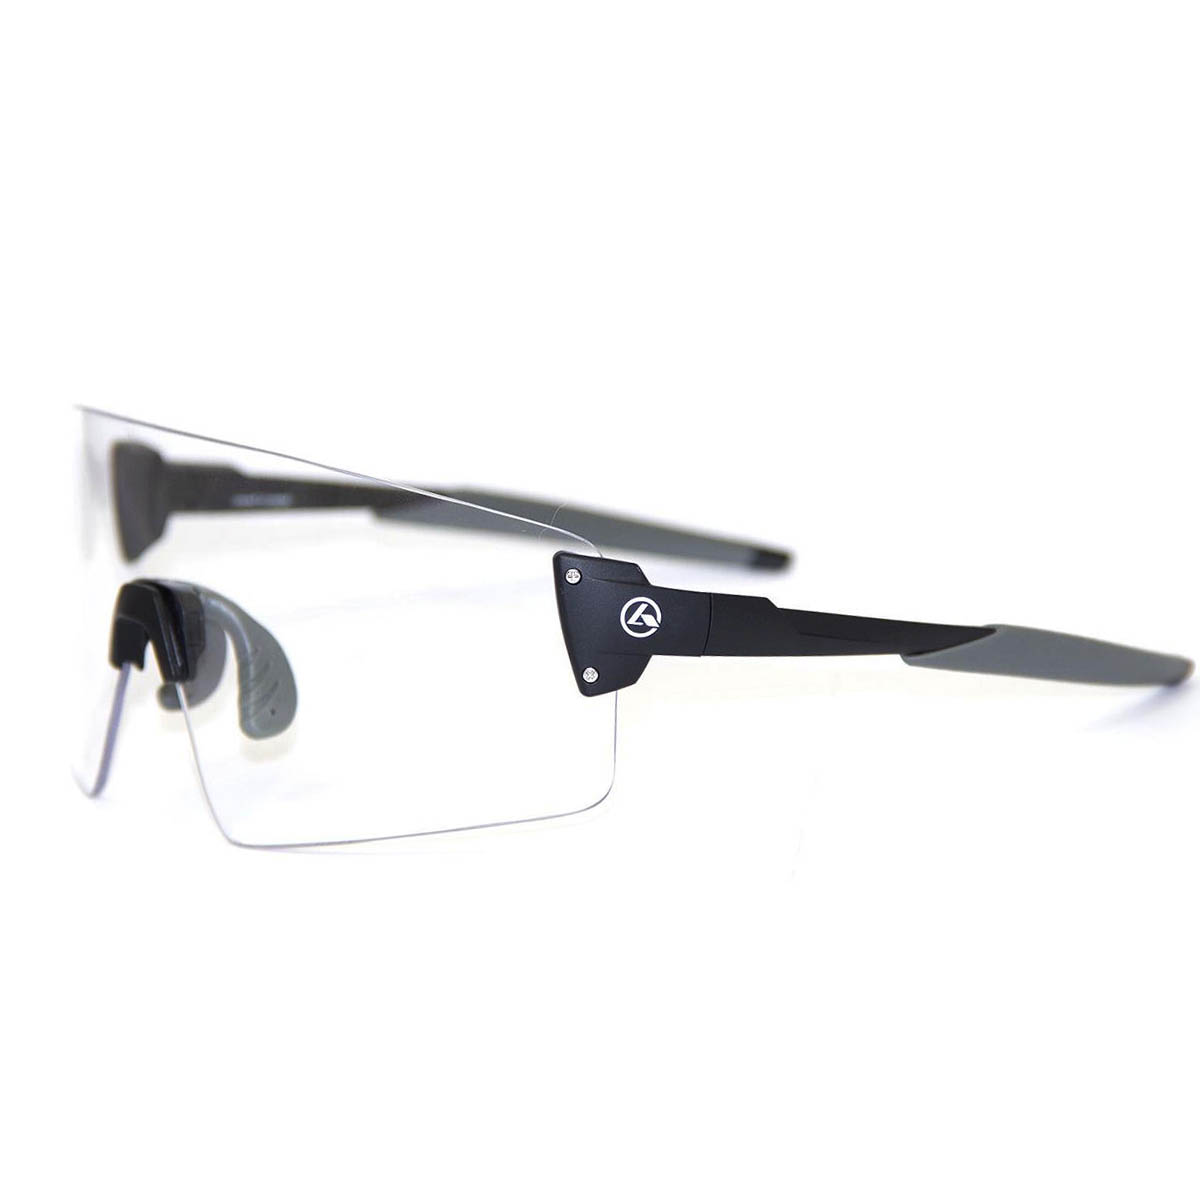 Óculos Ciclismo Absolute Prime EX Preto/Cinza Lente Transparente - CICLES  ELITON